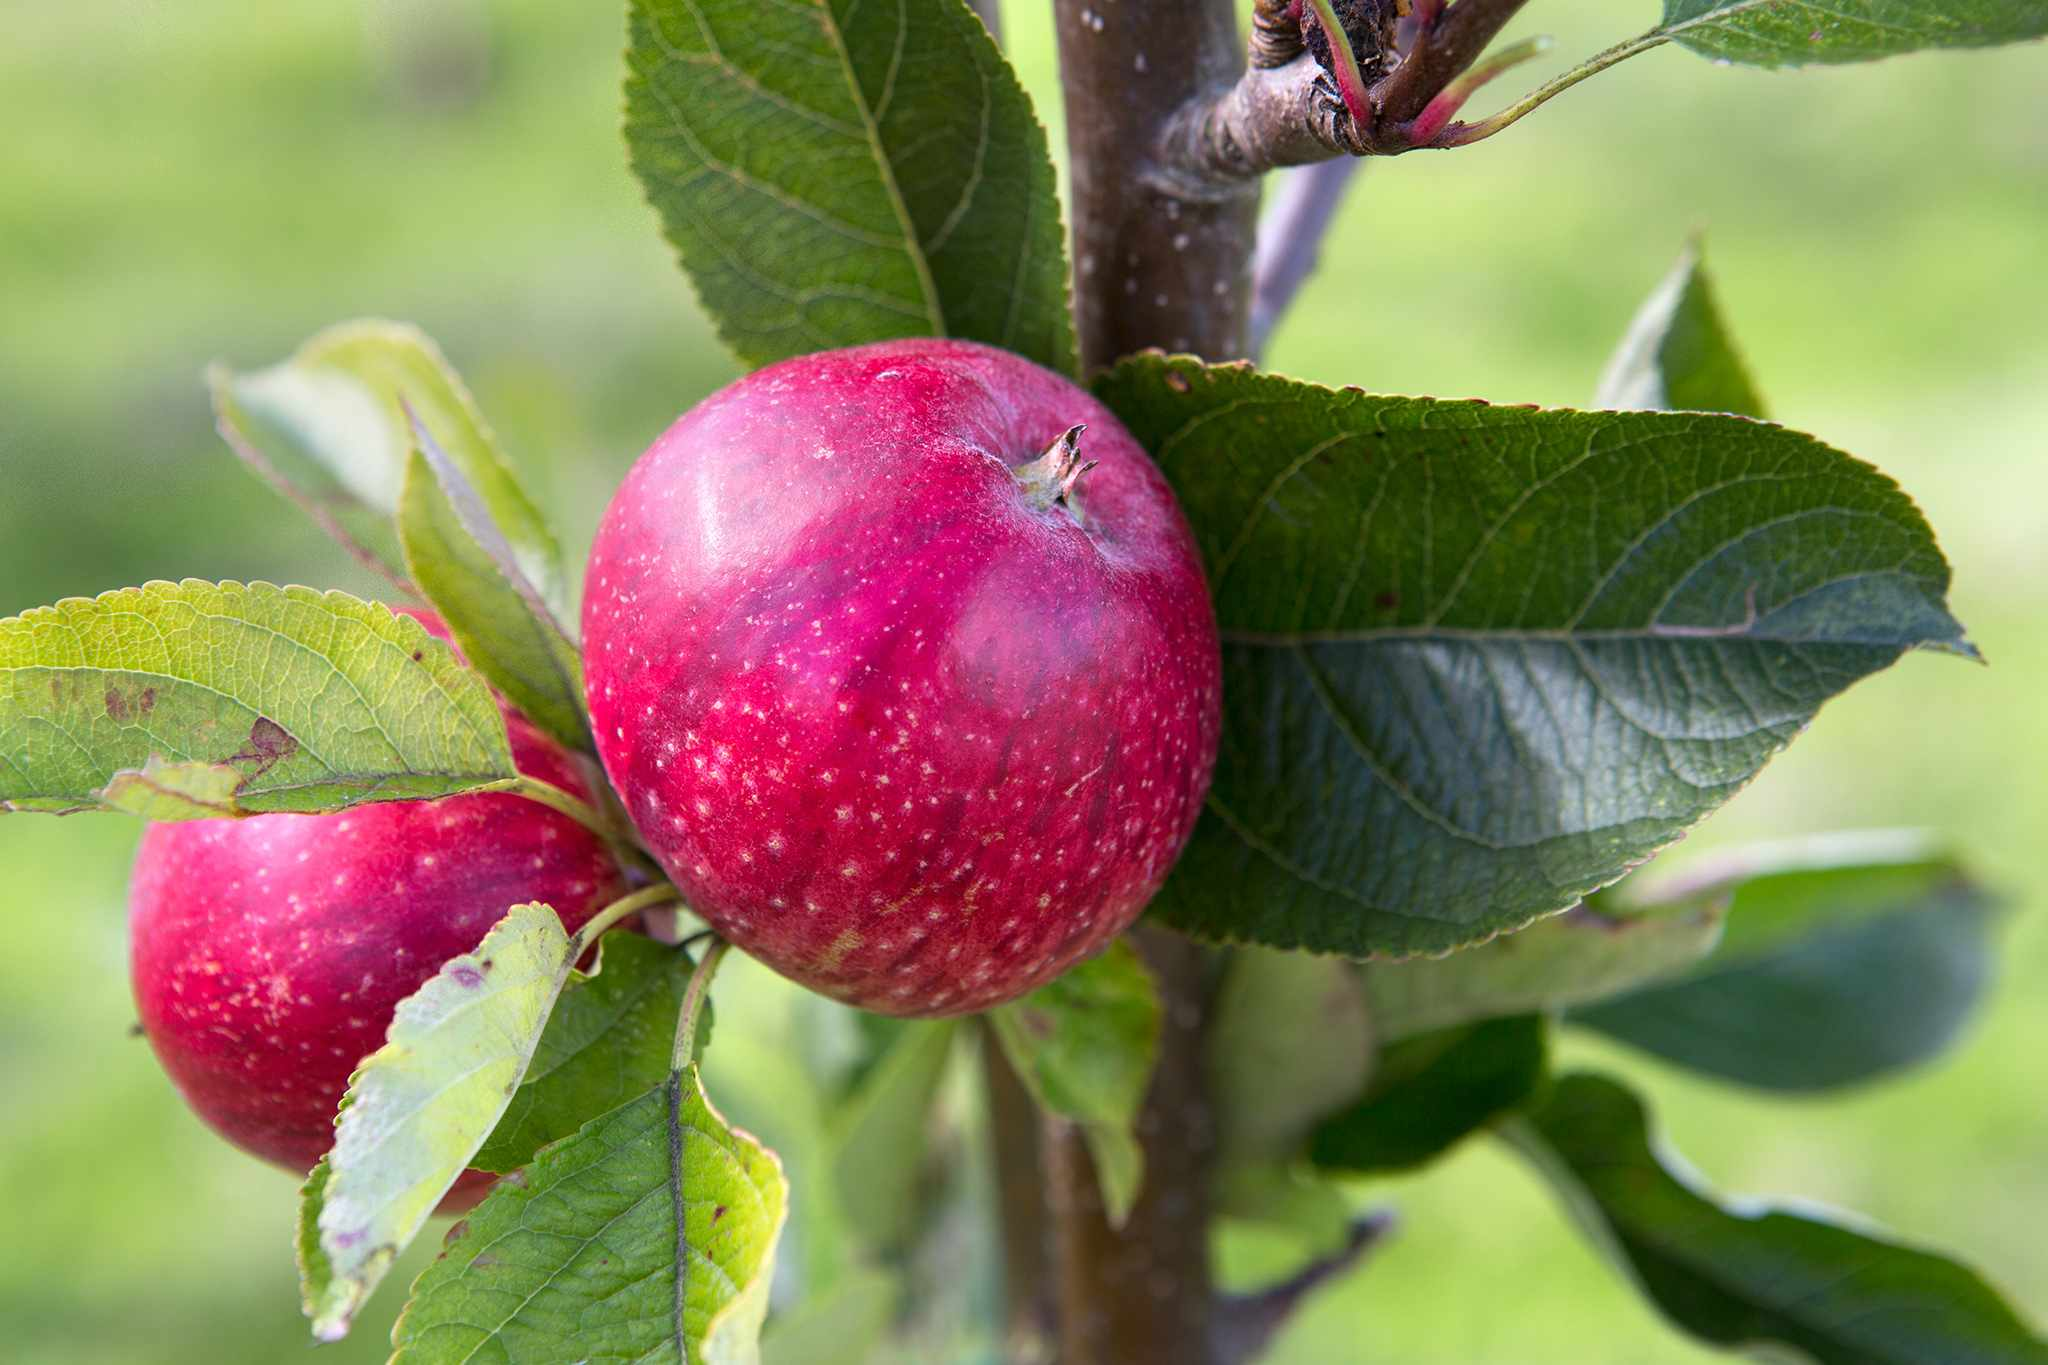 Best Apple Varieties to Grow